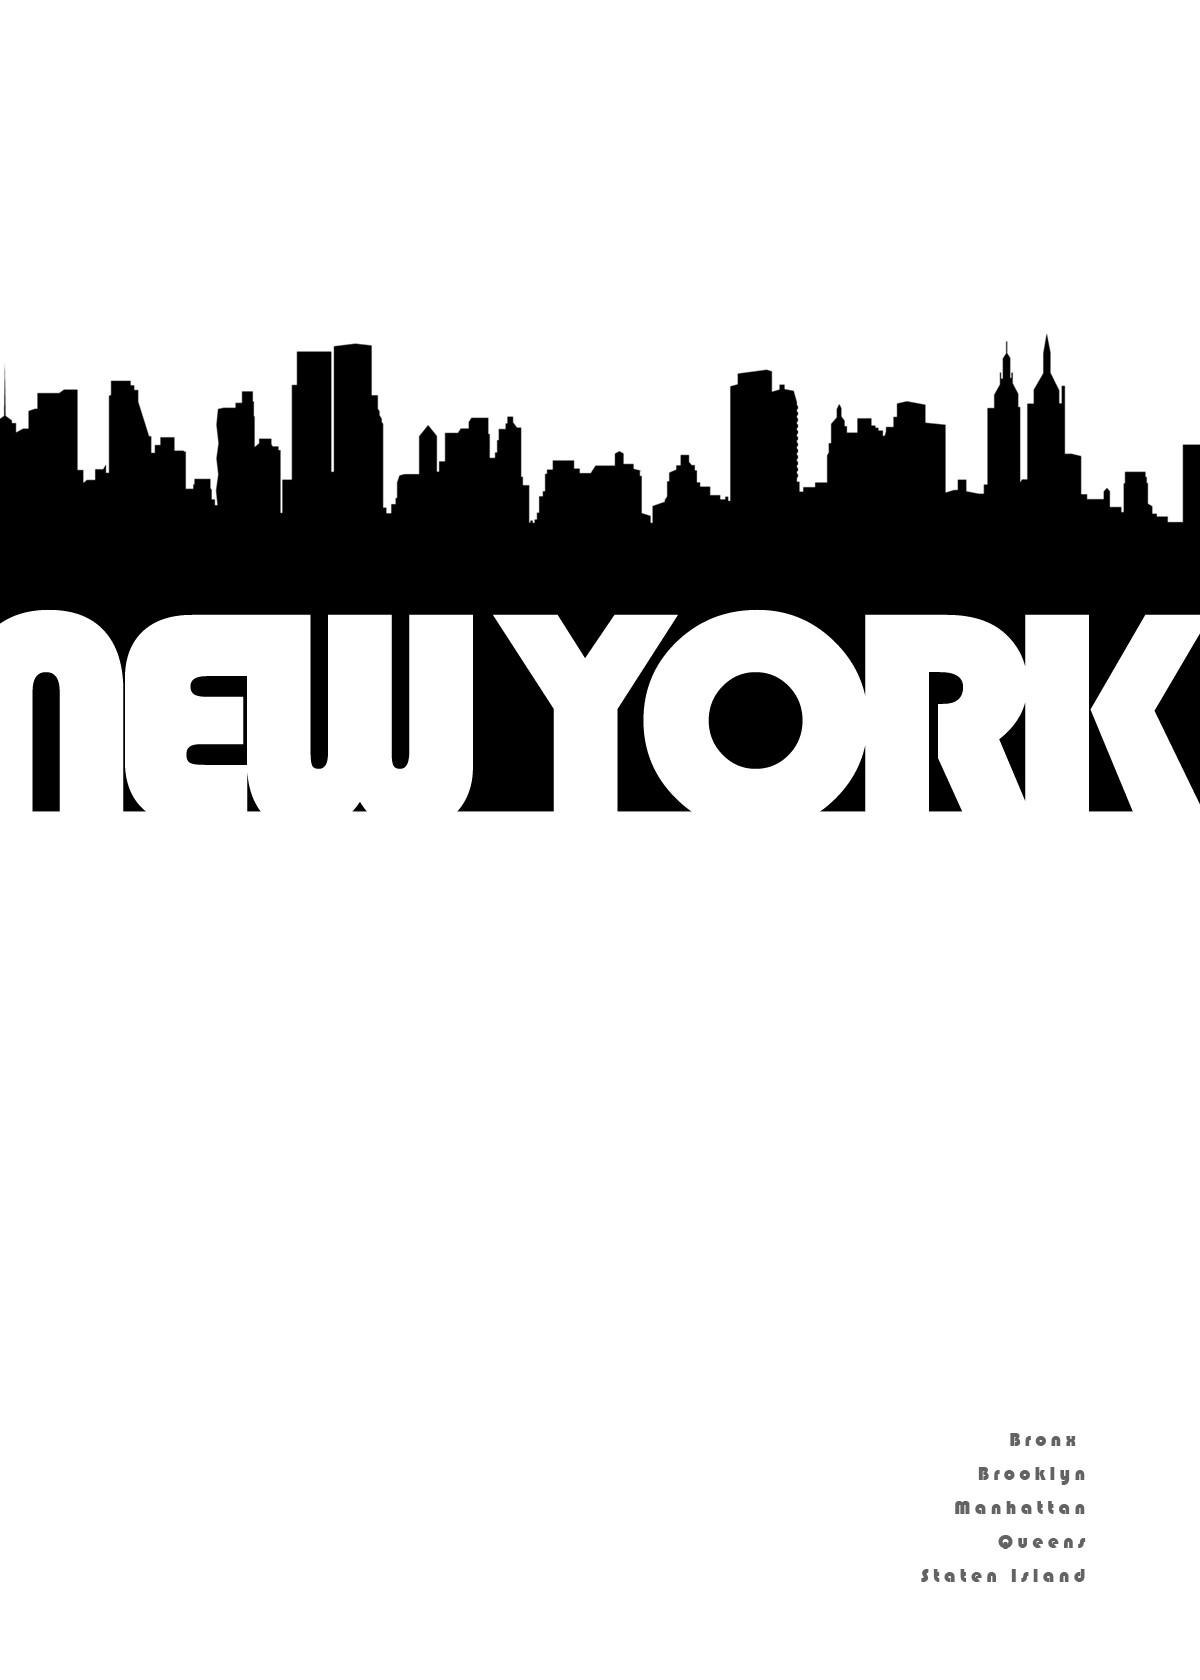 Free New York City Skyline Outline, Download Free Clip Art.